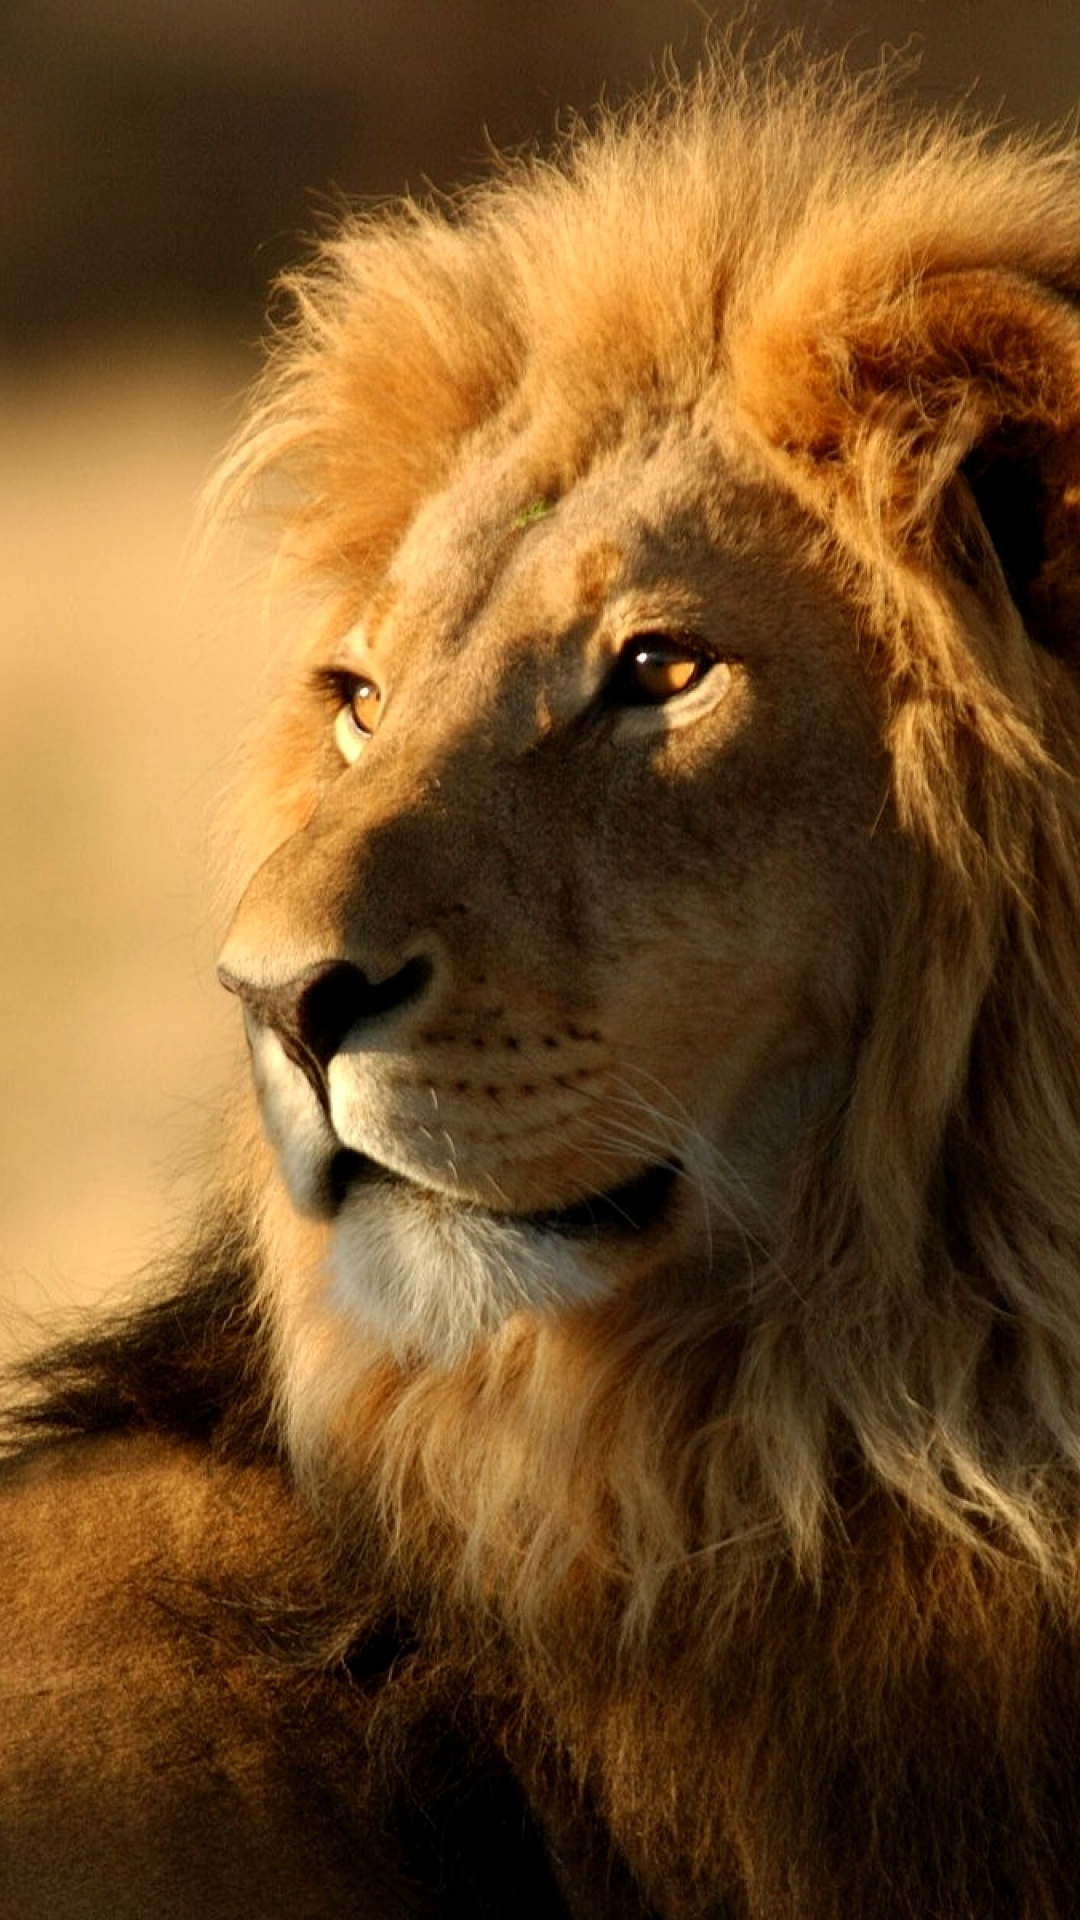 Lion Wallpaper Hd Animals Lion Iphone 6 Plus Wallpaper 1080x1920